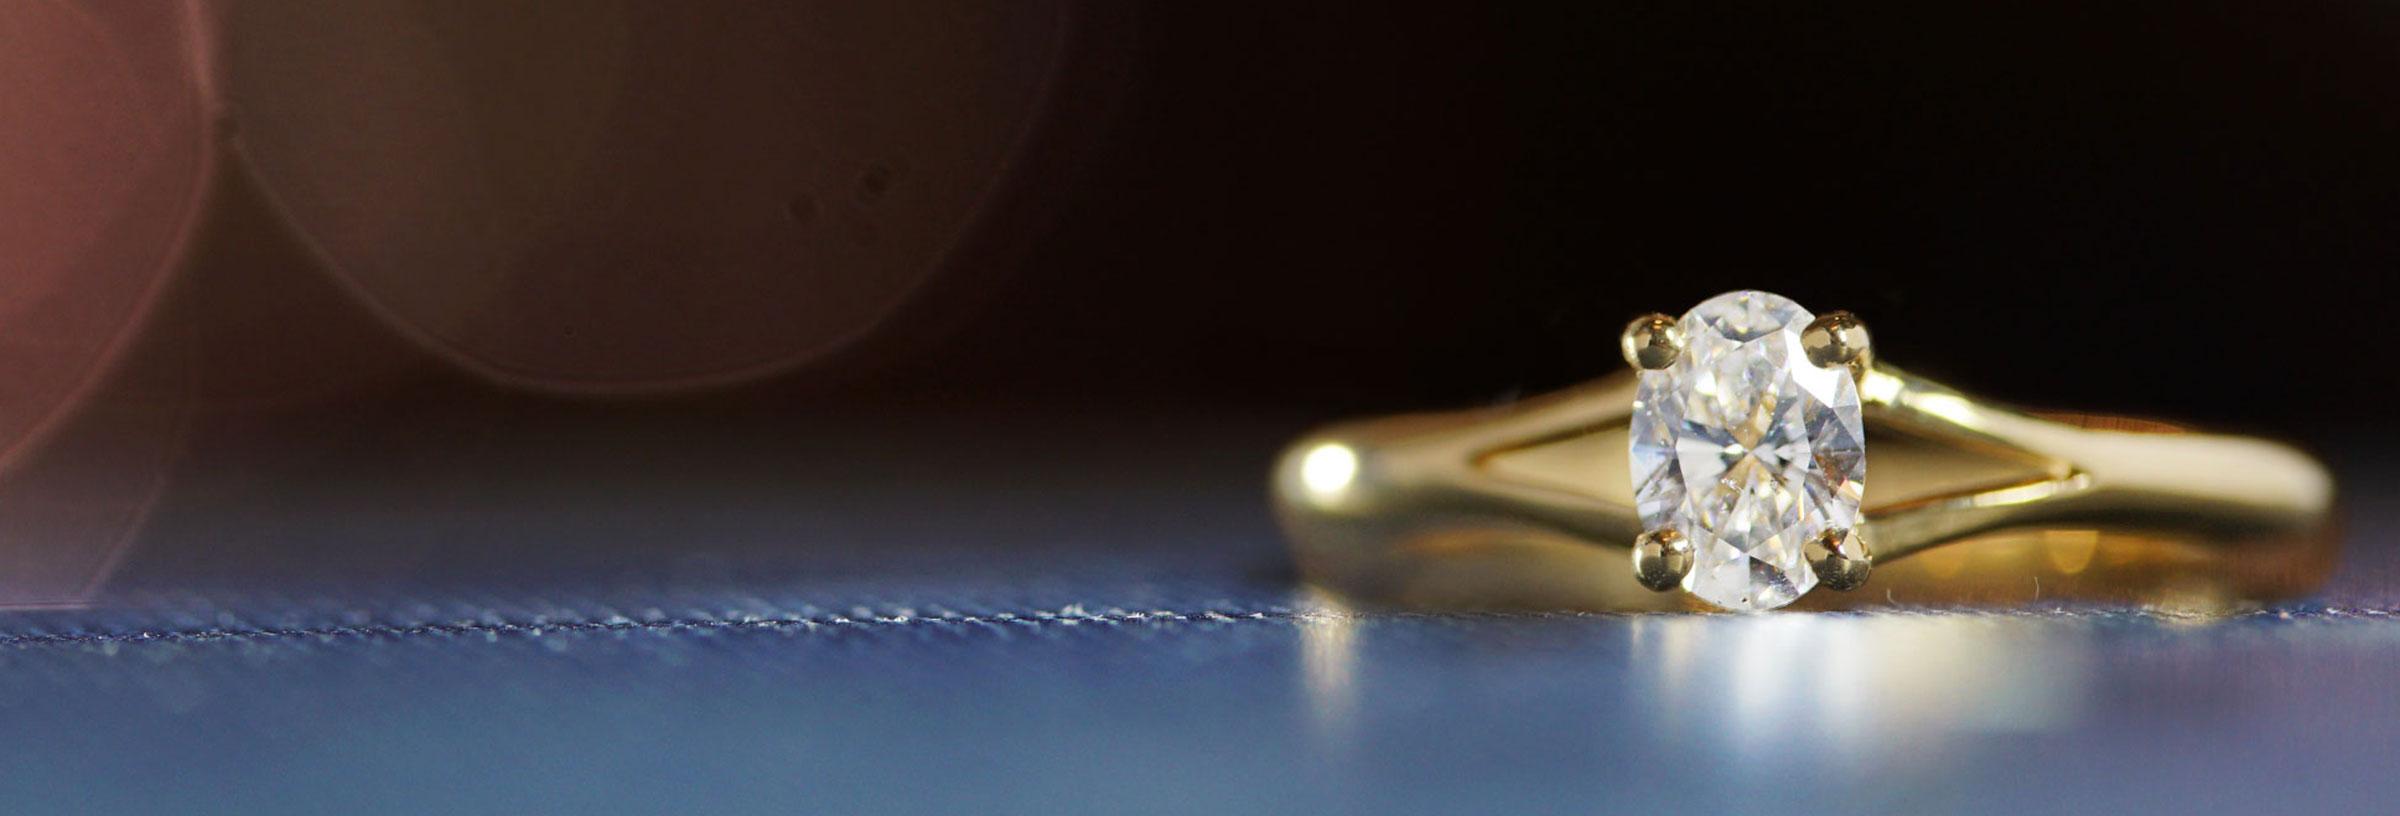 yellow-gold-split-band-oval-diamond-engagement